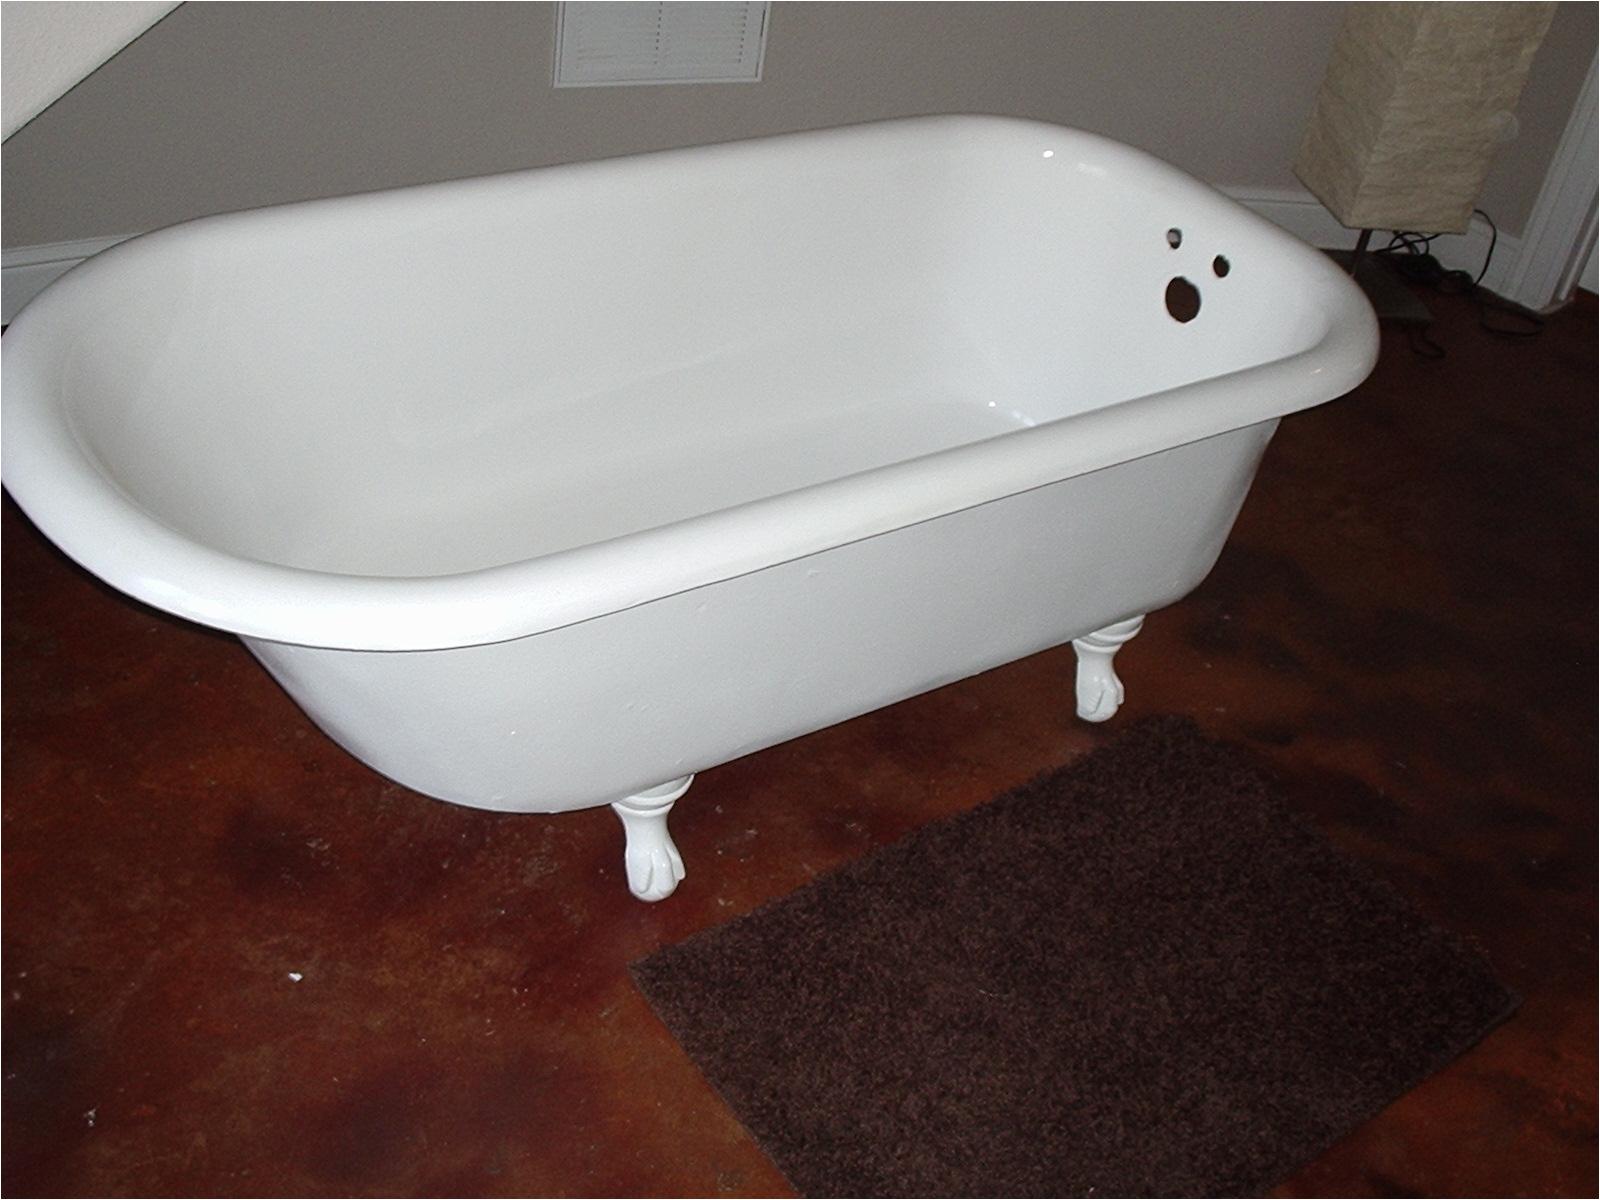 Bathtub Reglazing atlanta Pictuares Of Bathtub Refinishing Sink Repairs In atlanta